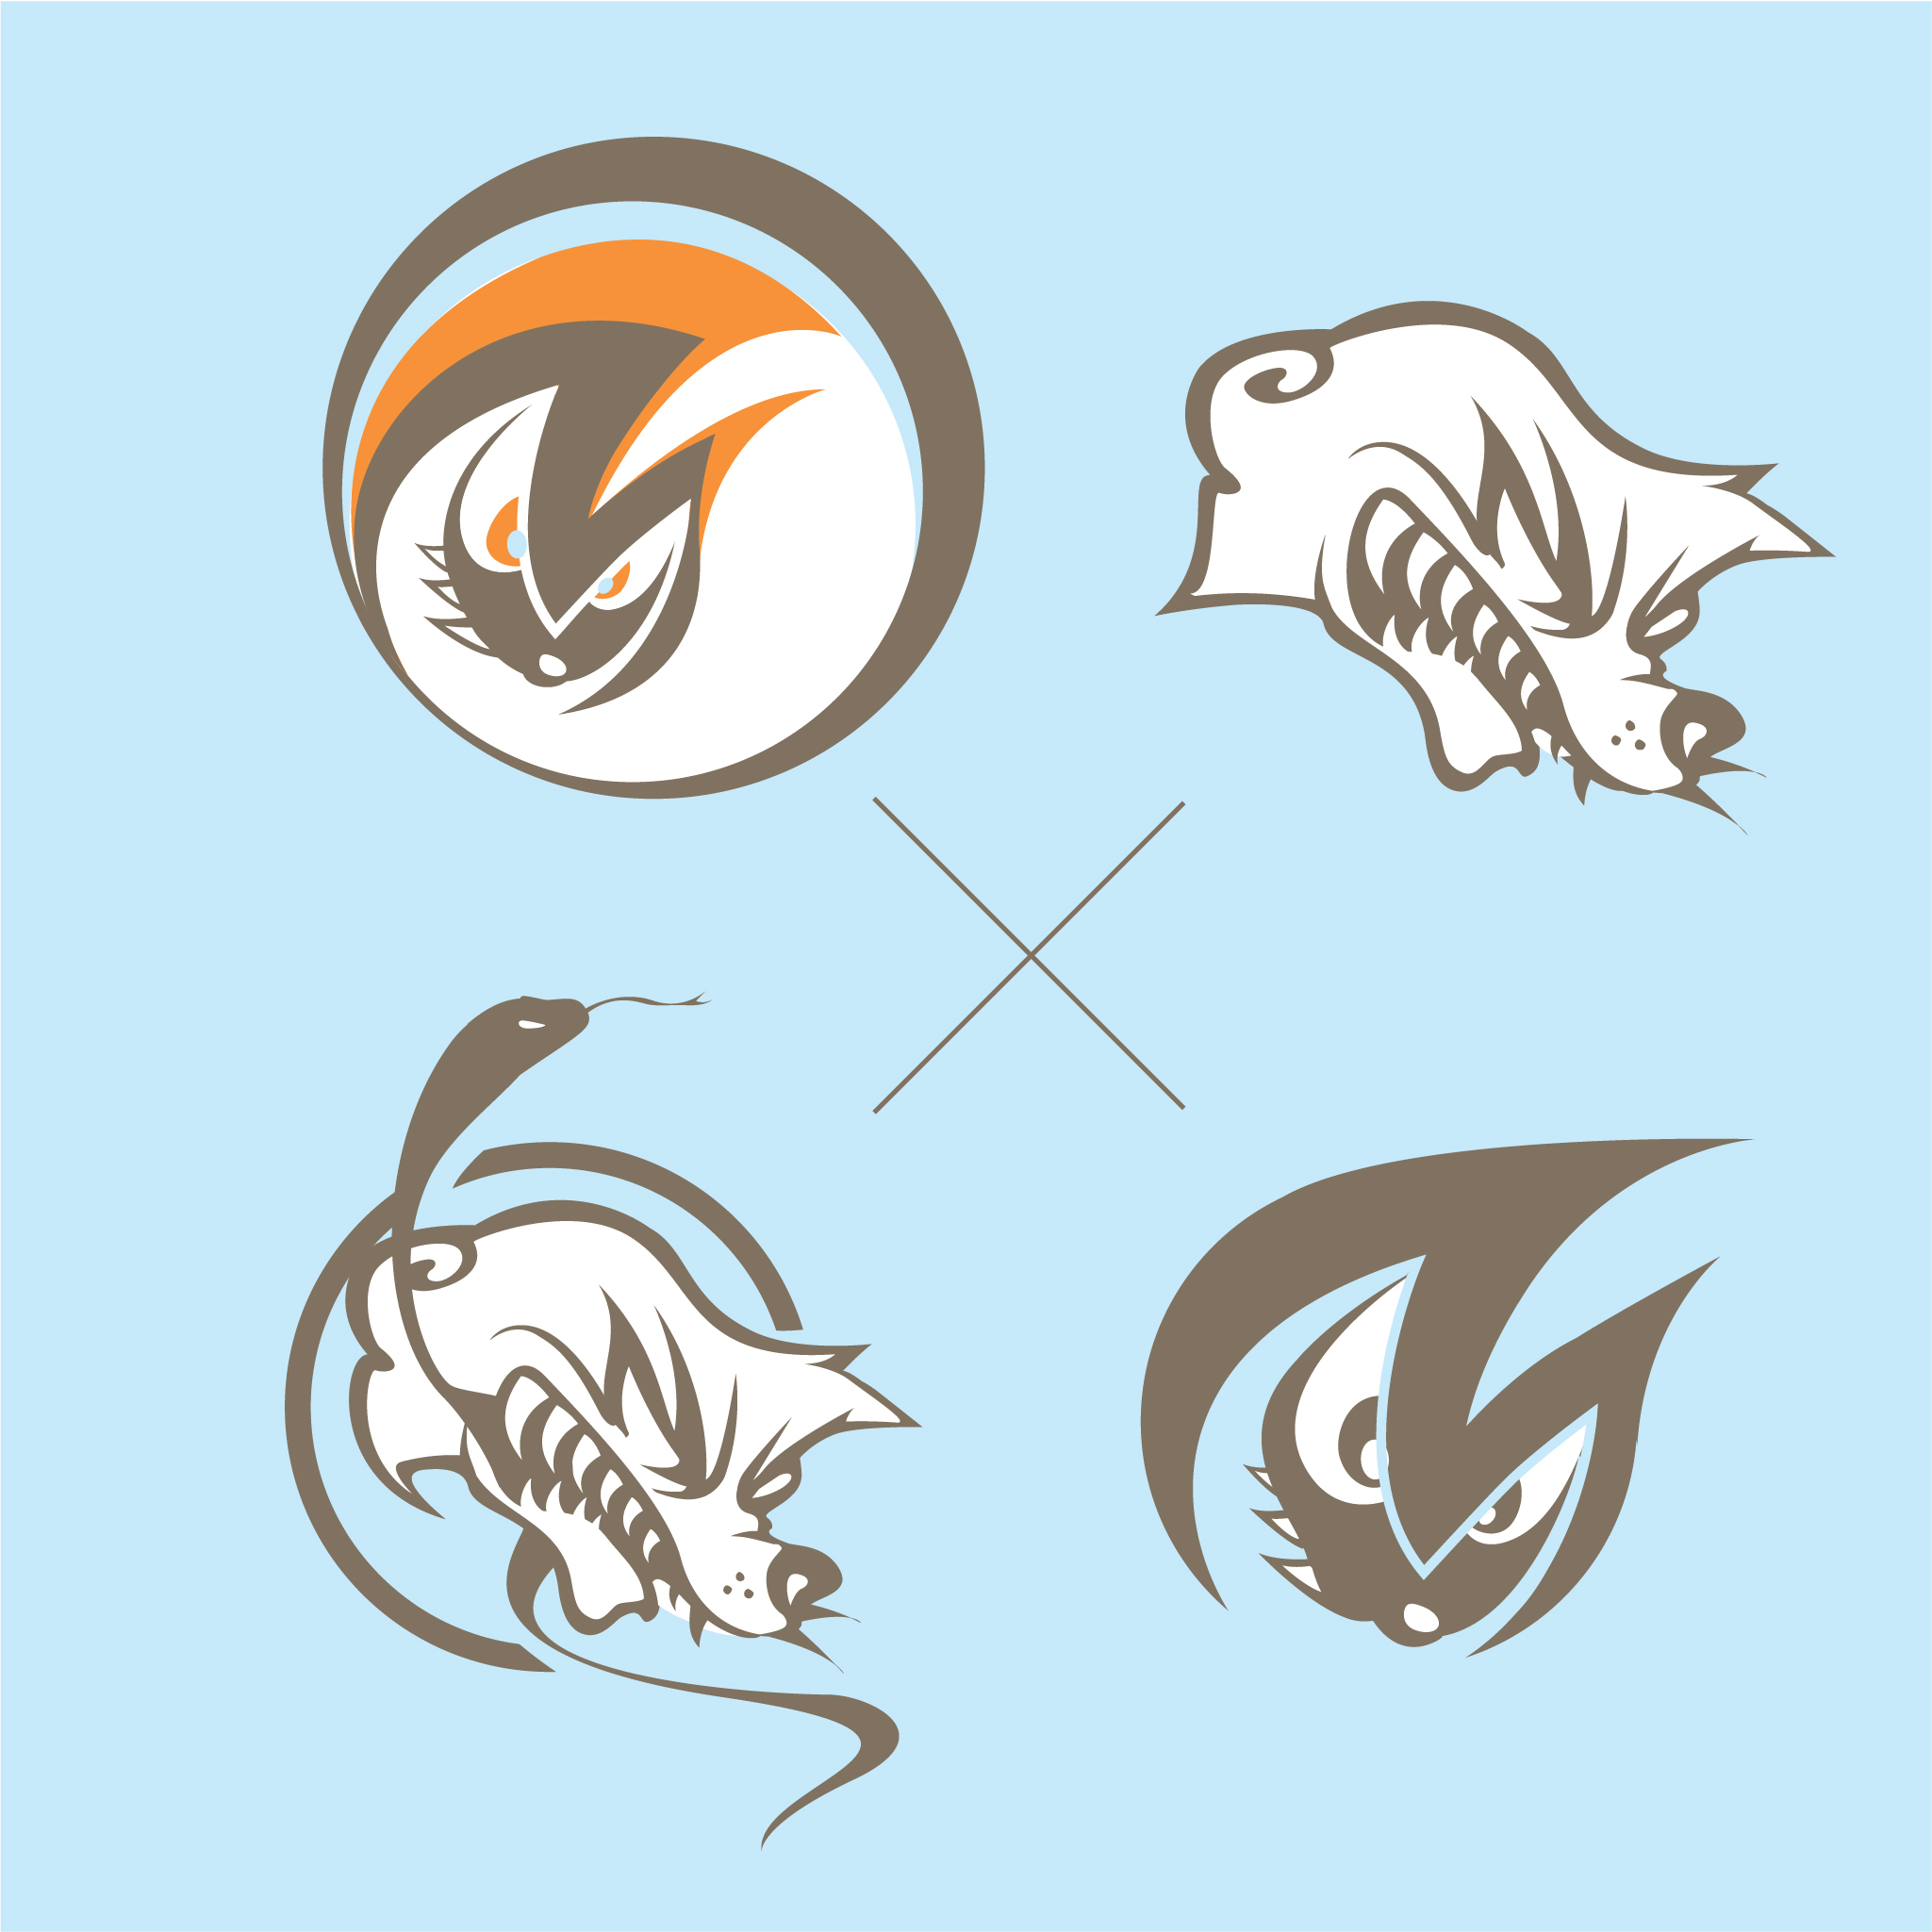 mongooses.jpg